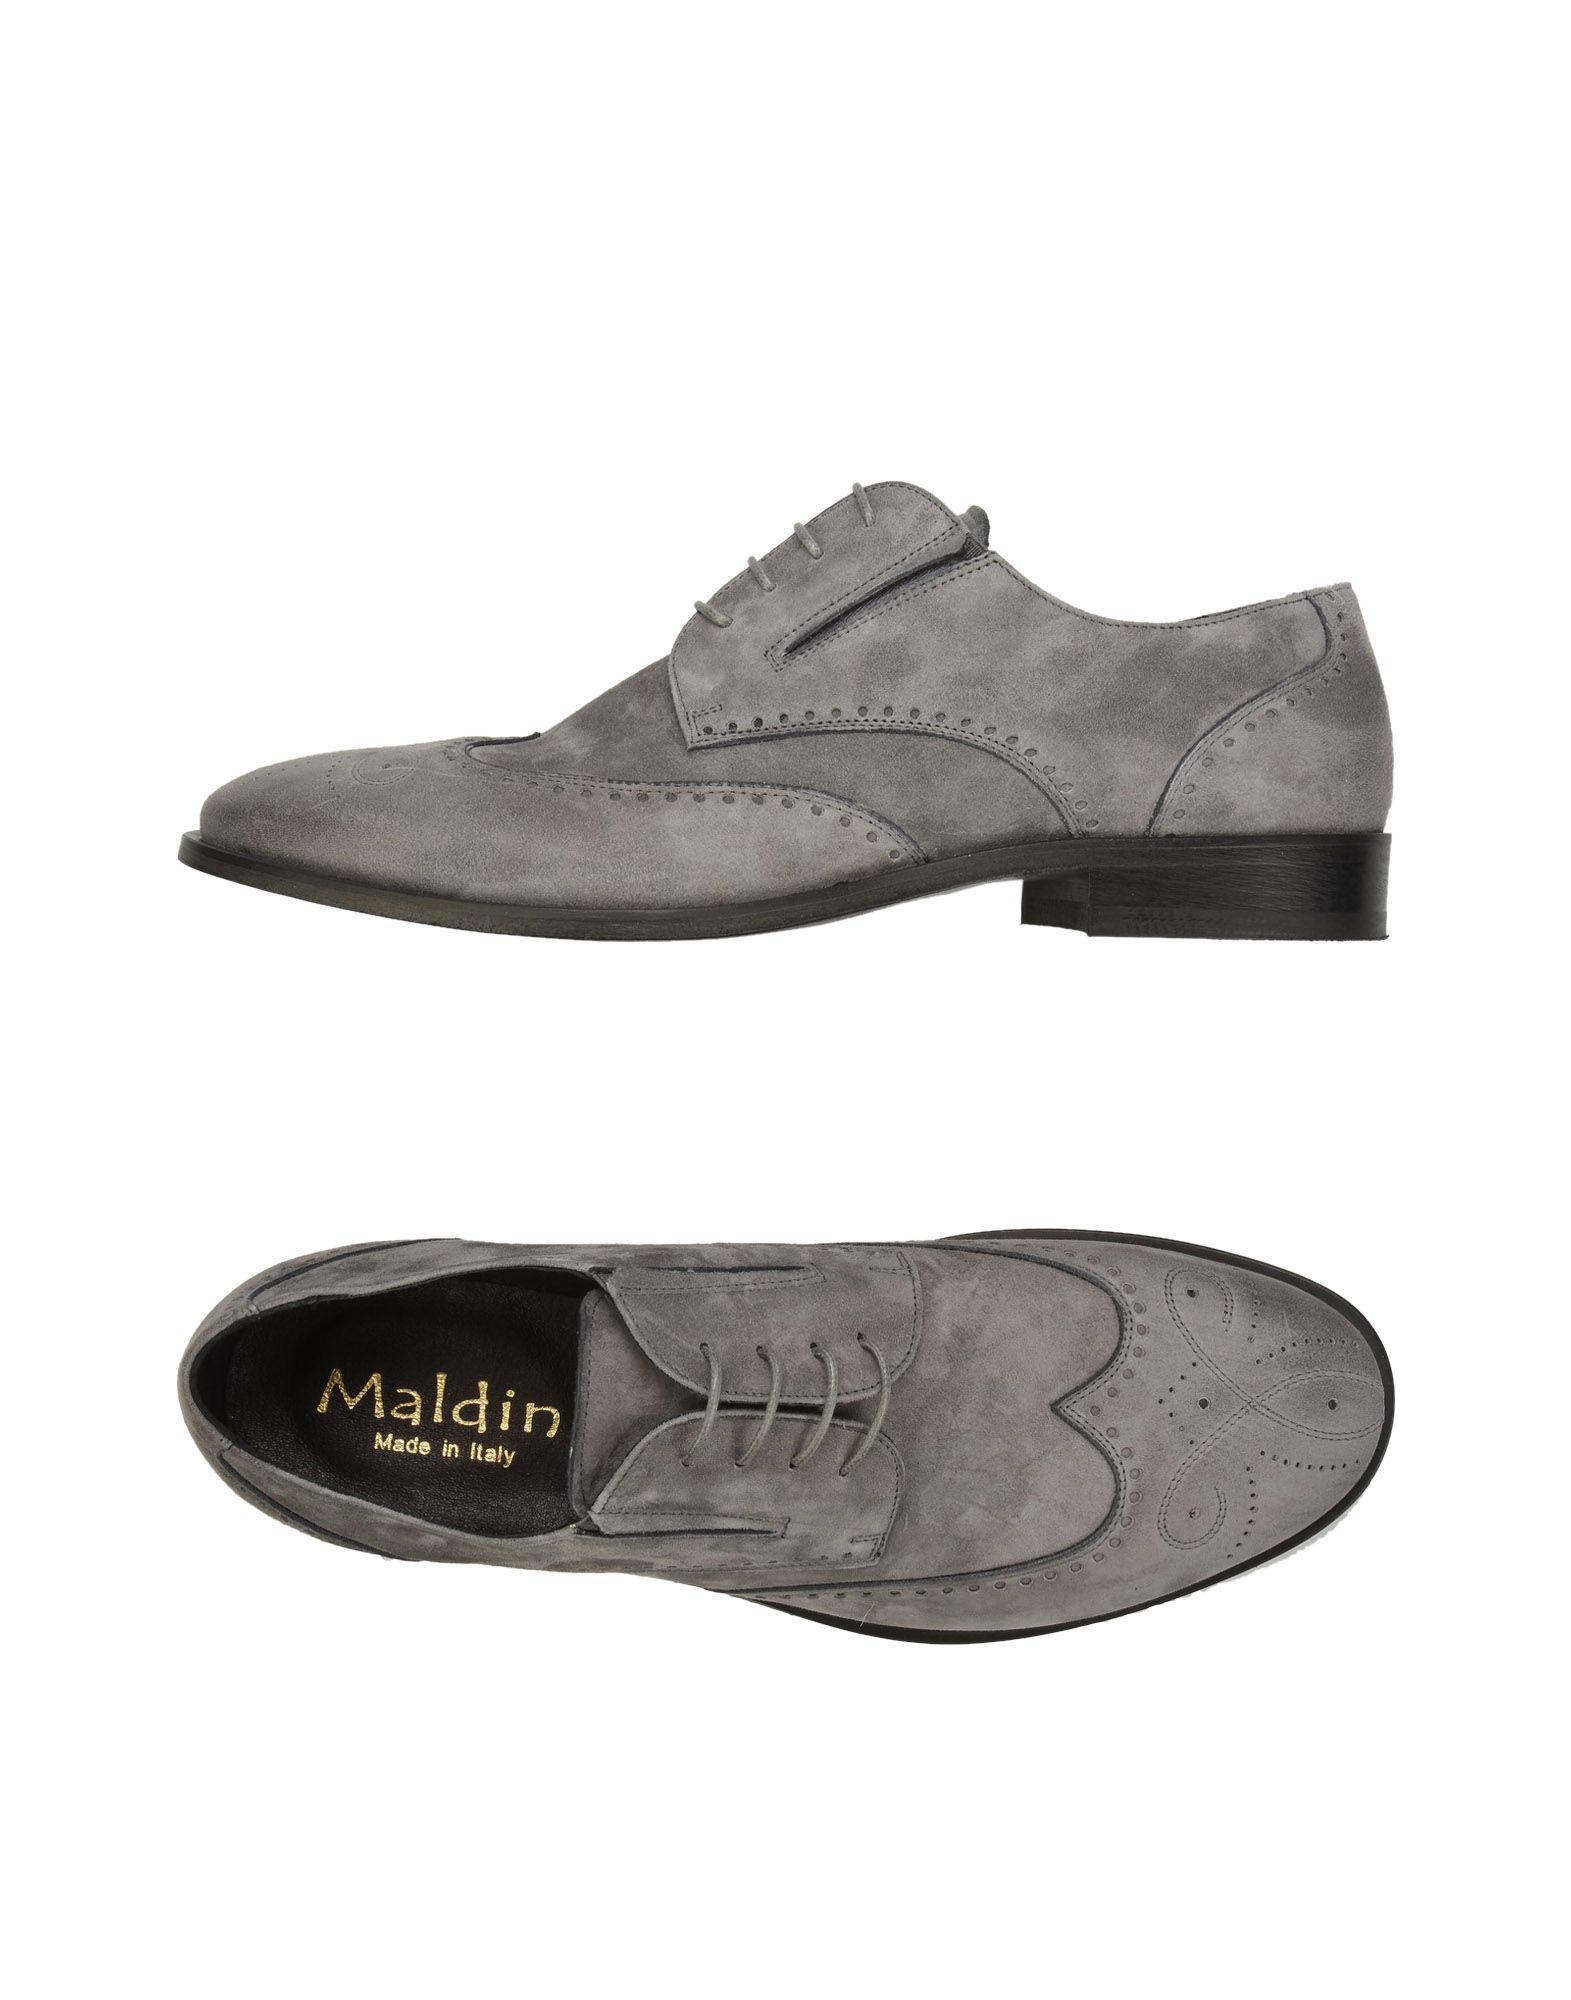 Stringate Maldini 618 - Uomo - 11419768KH